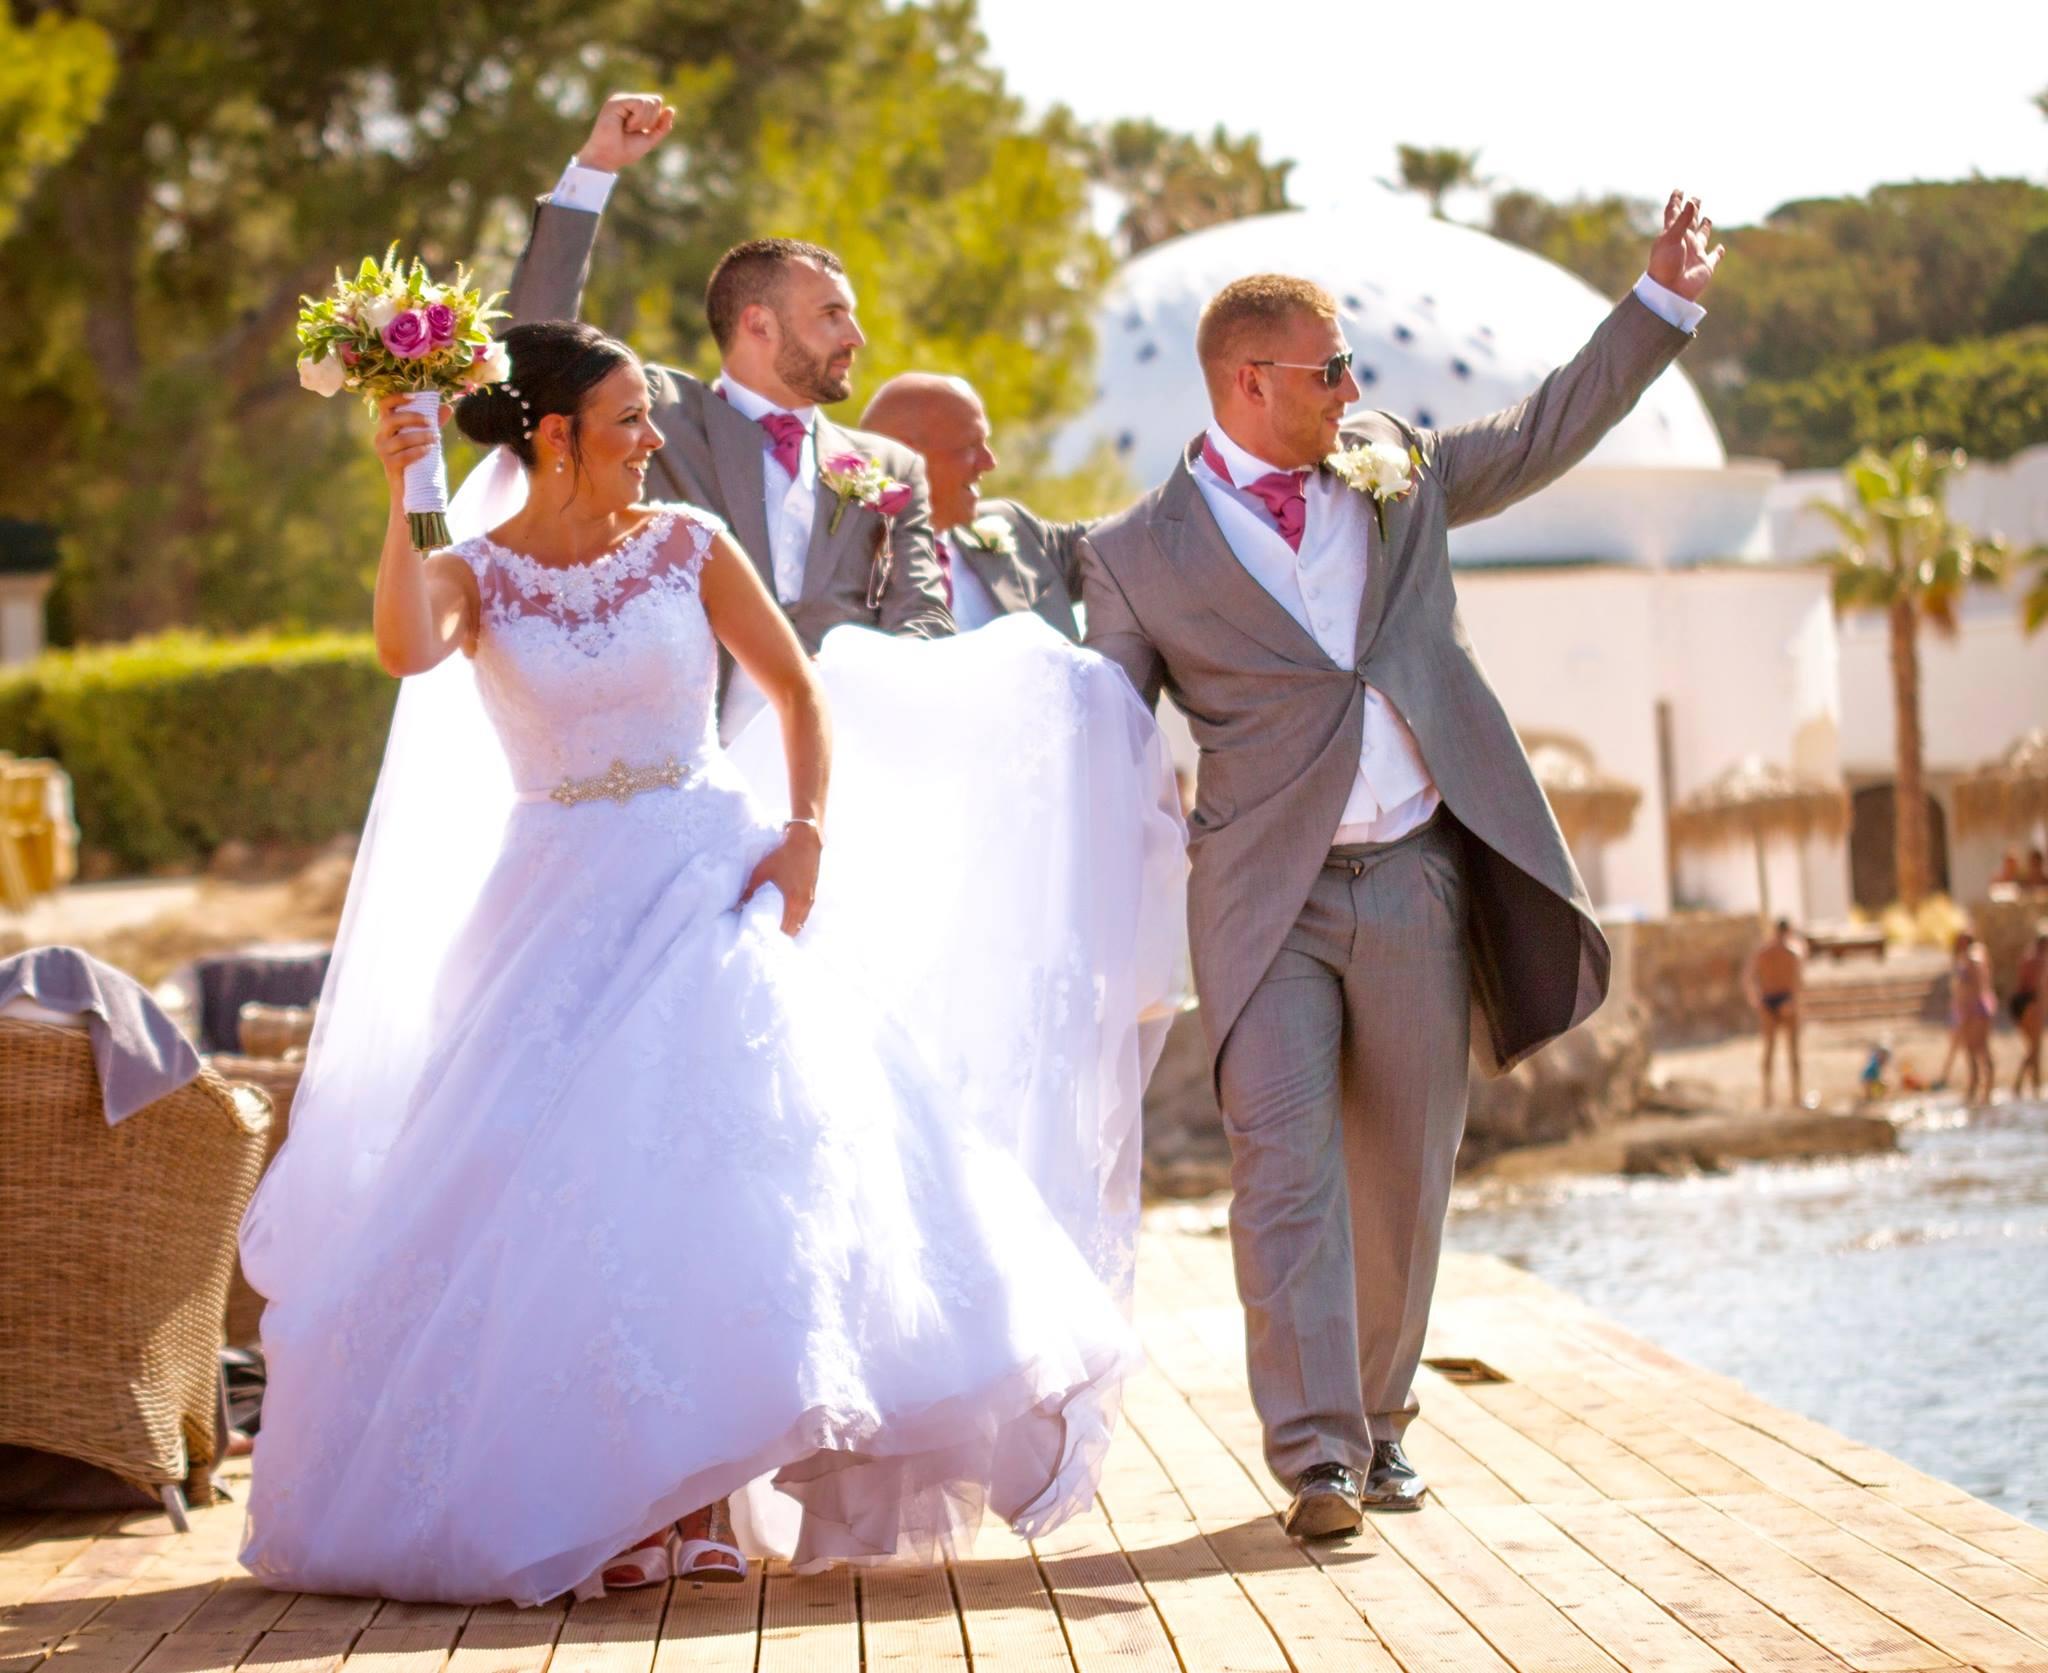 Unique Wedding Venues Near Me For Unforgettable Moment: Your Unique Wedding In Rhodes, Greece